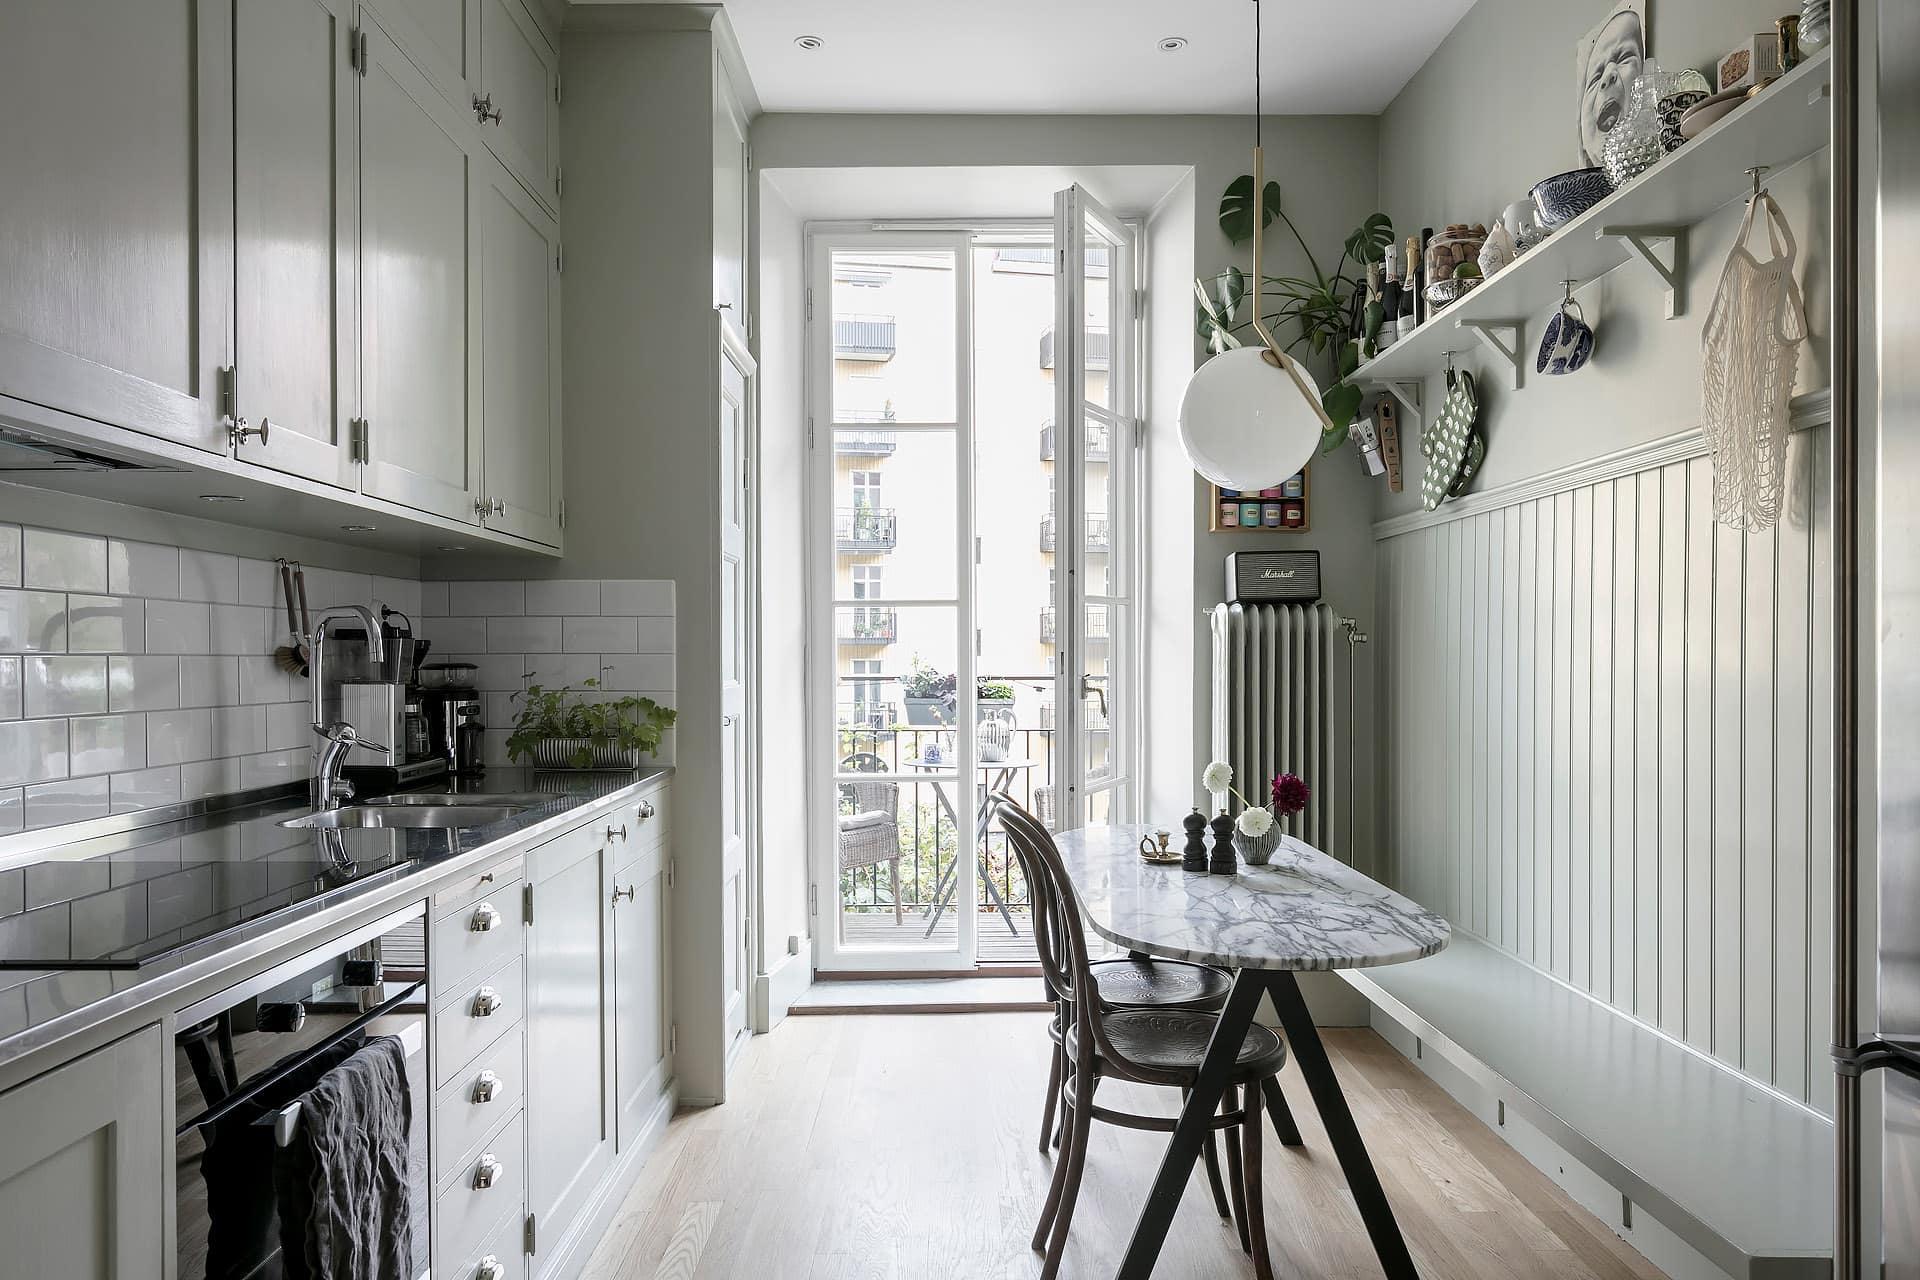 Rustic kitchen in greige - COCO LAPINE DESIGNCOCO LAPINE DESIGN